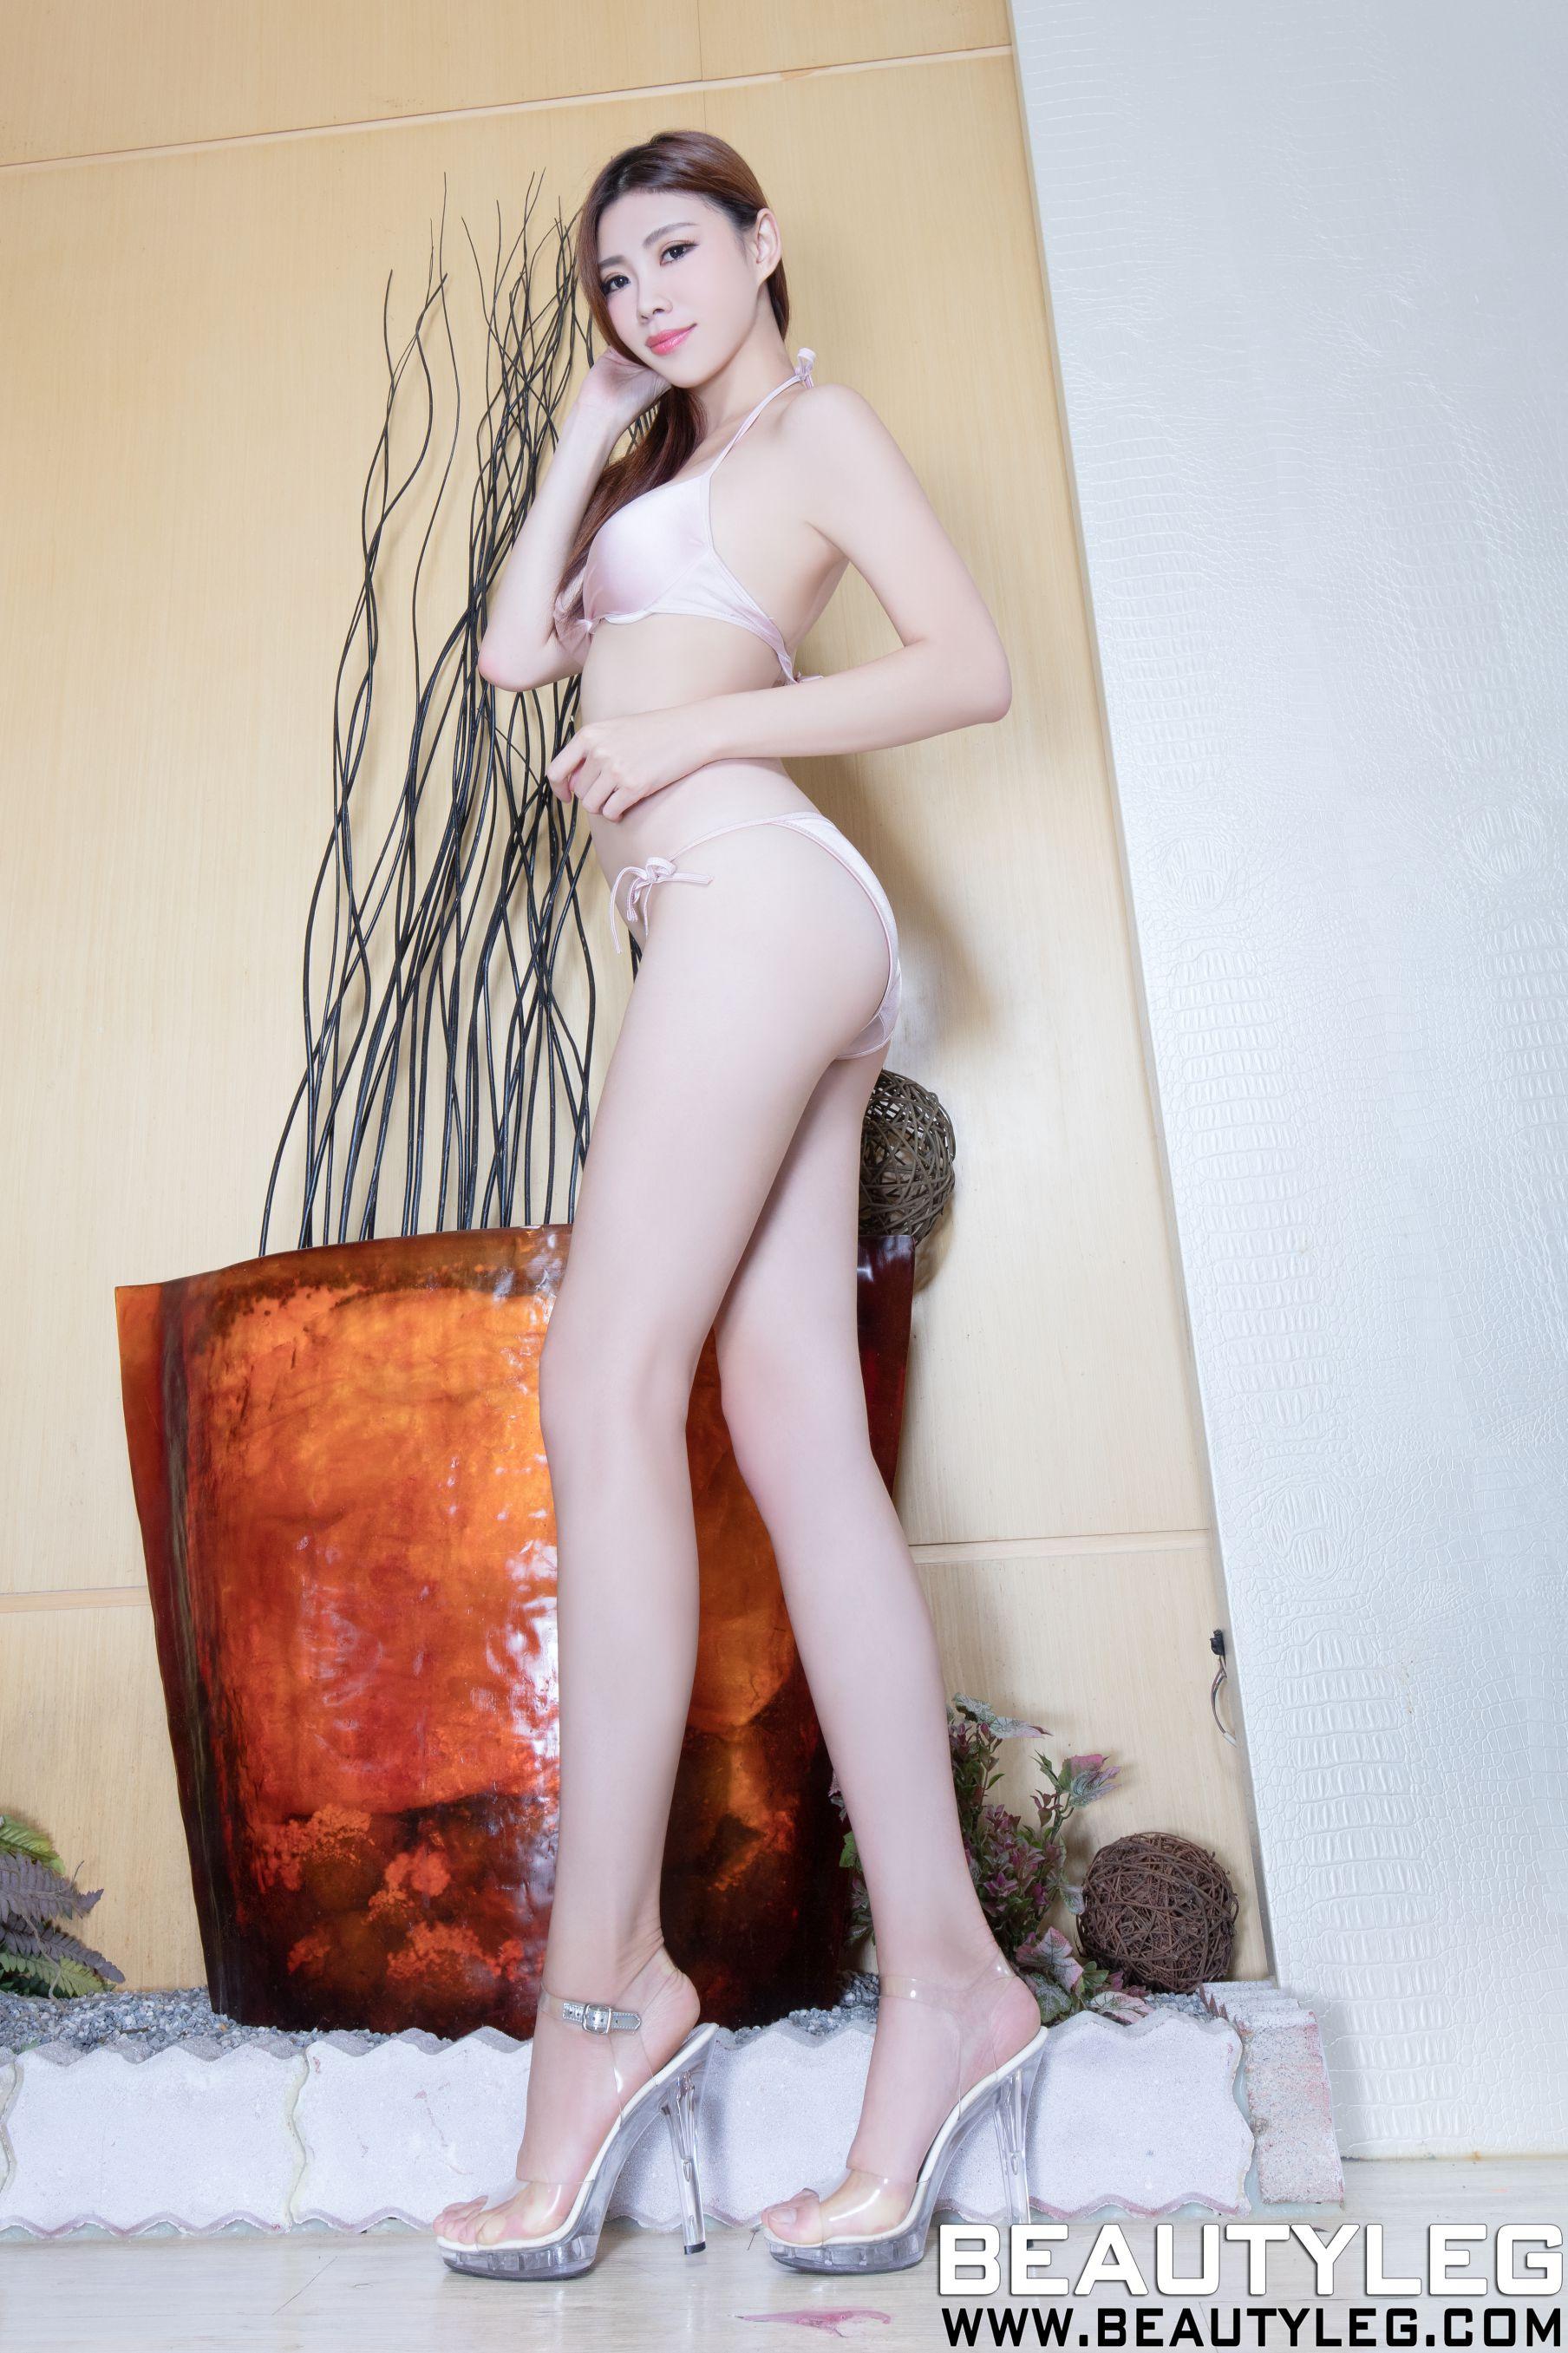 VOL.1964 [Beautyleg]泳装高跟美腿:腿模Zoey(Zoey)高品质写真套图(41P)